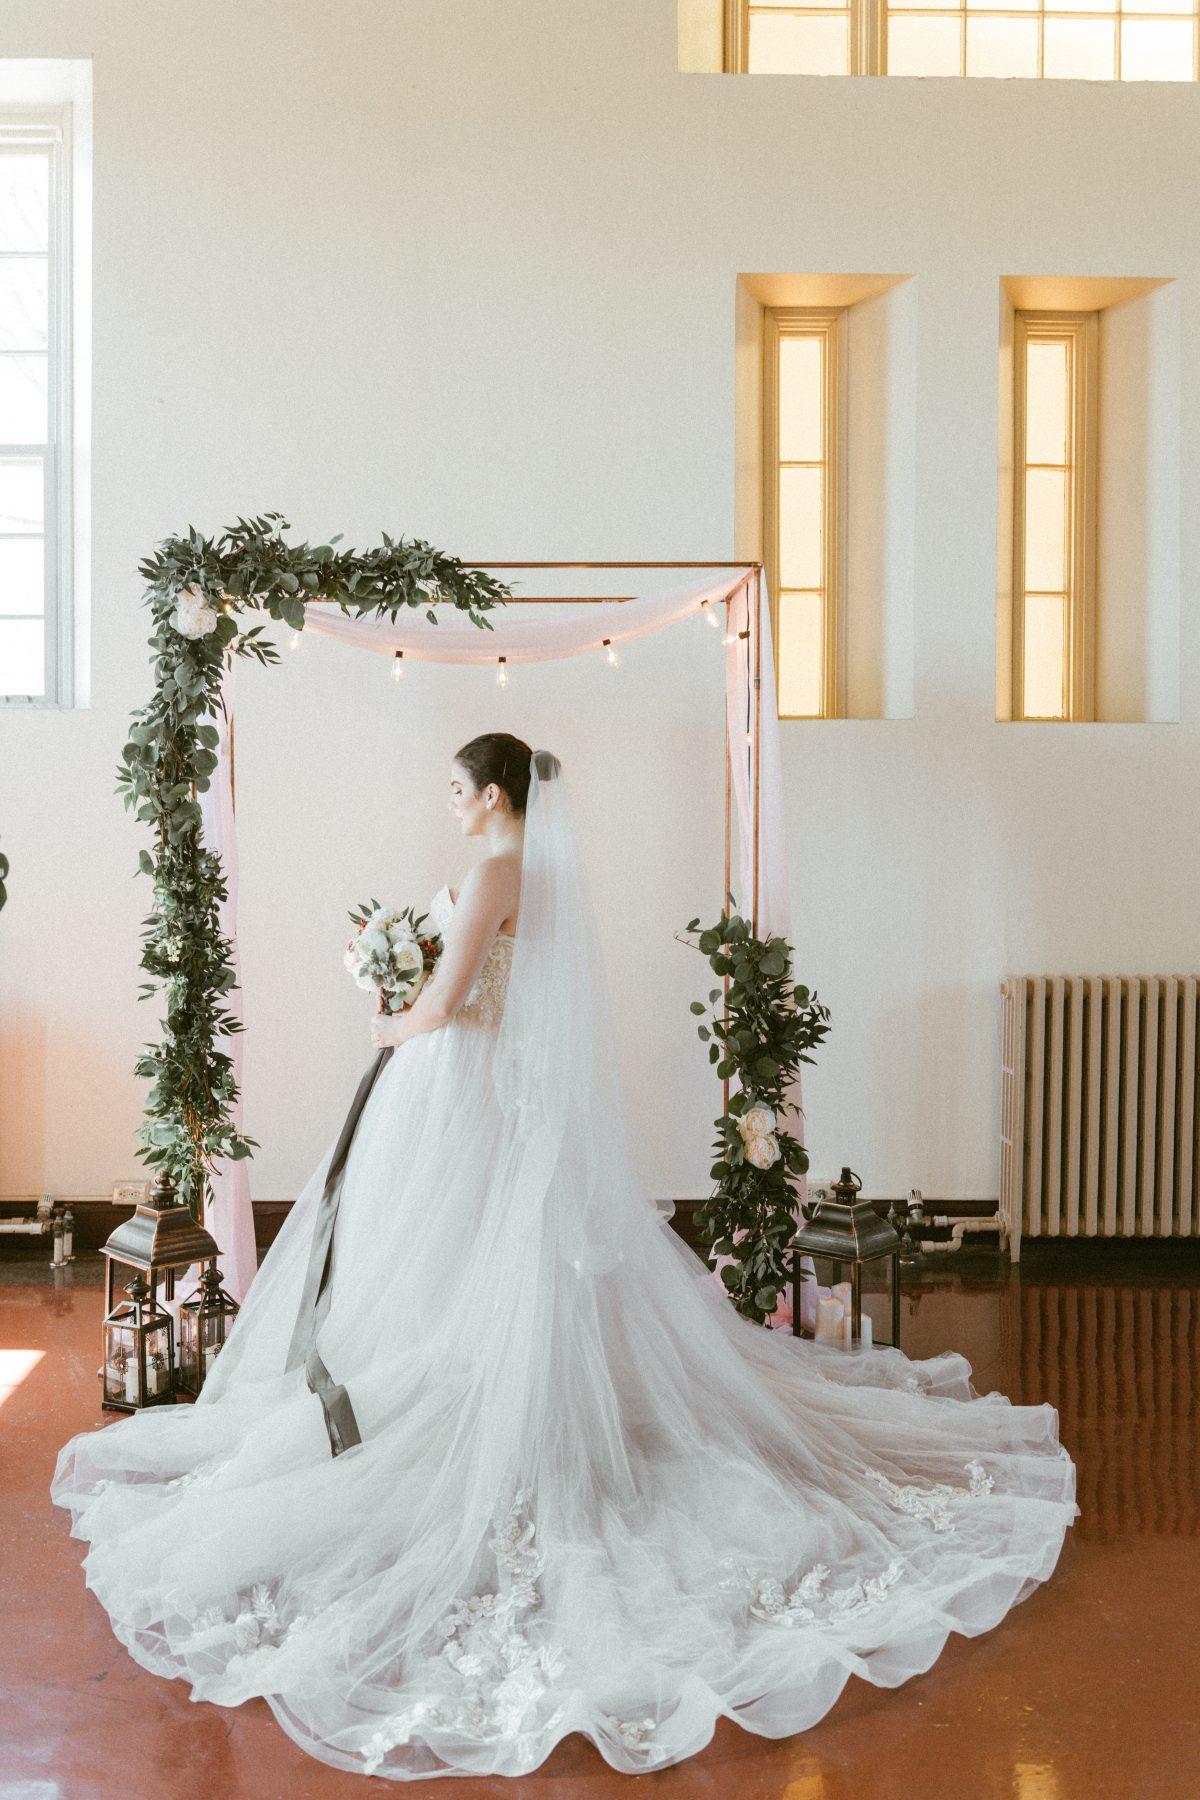 Mings-Photography-Industrial-Elegant-Bridal-Editorial-17.jpg